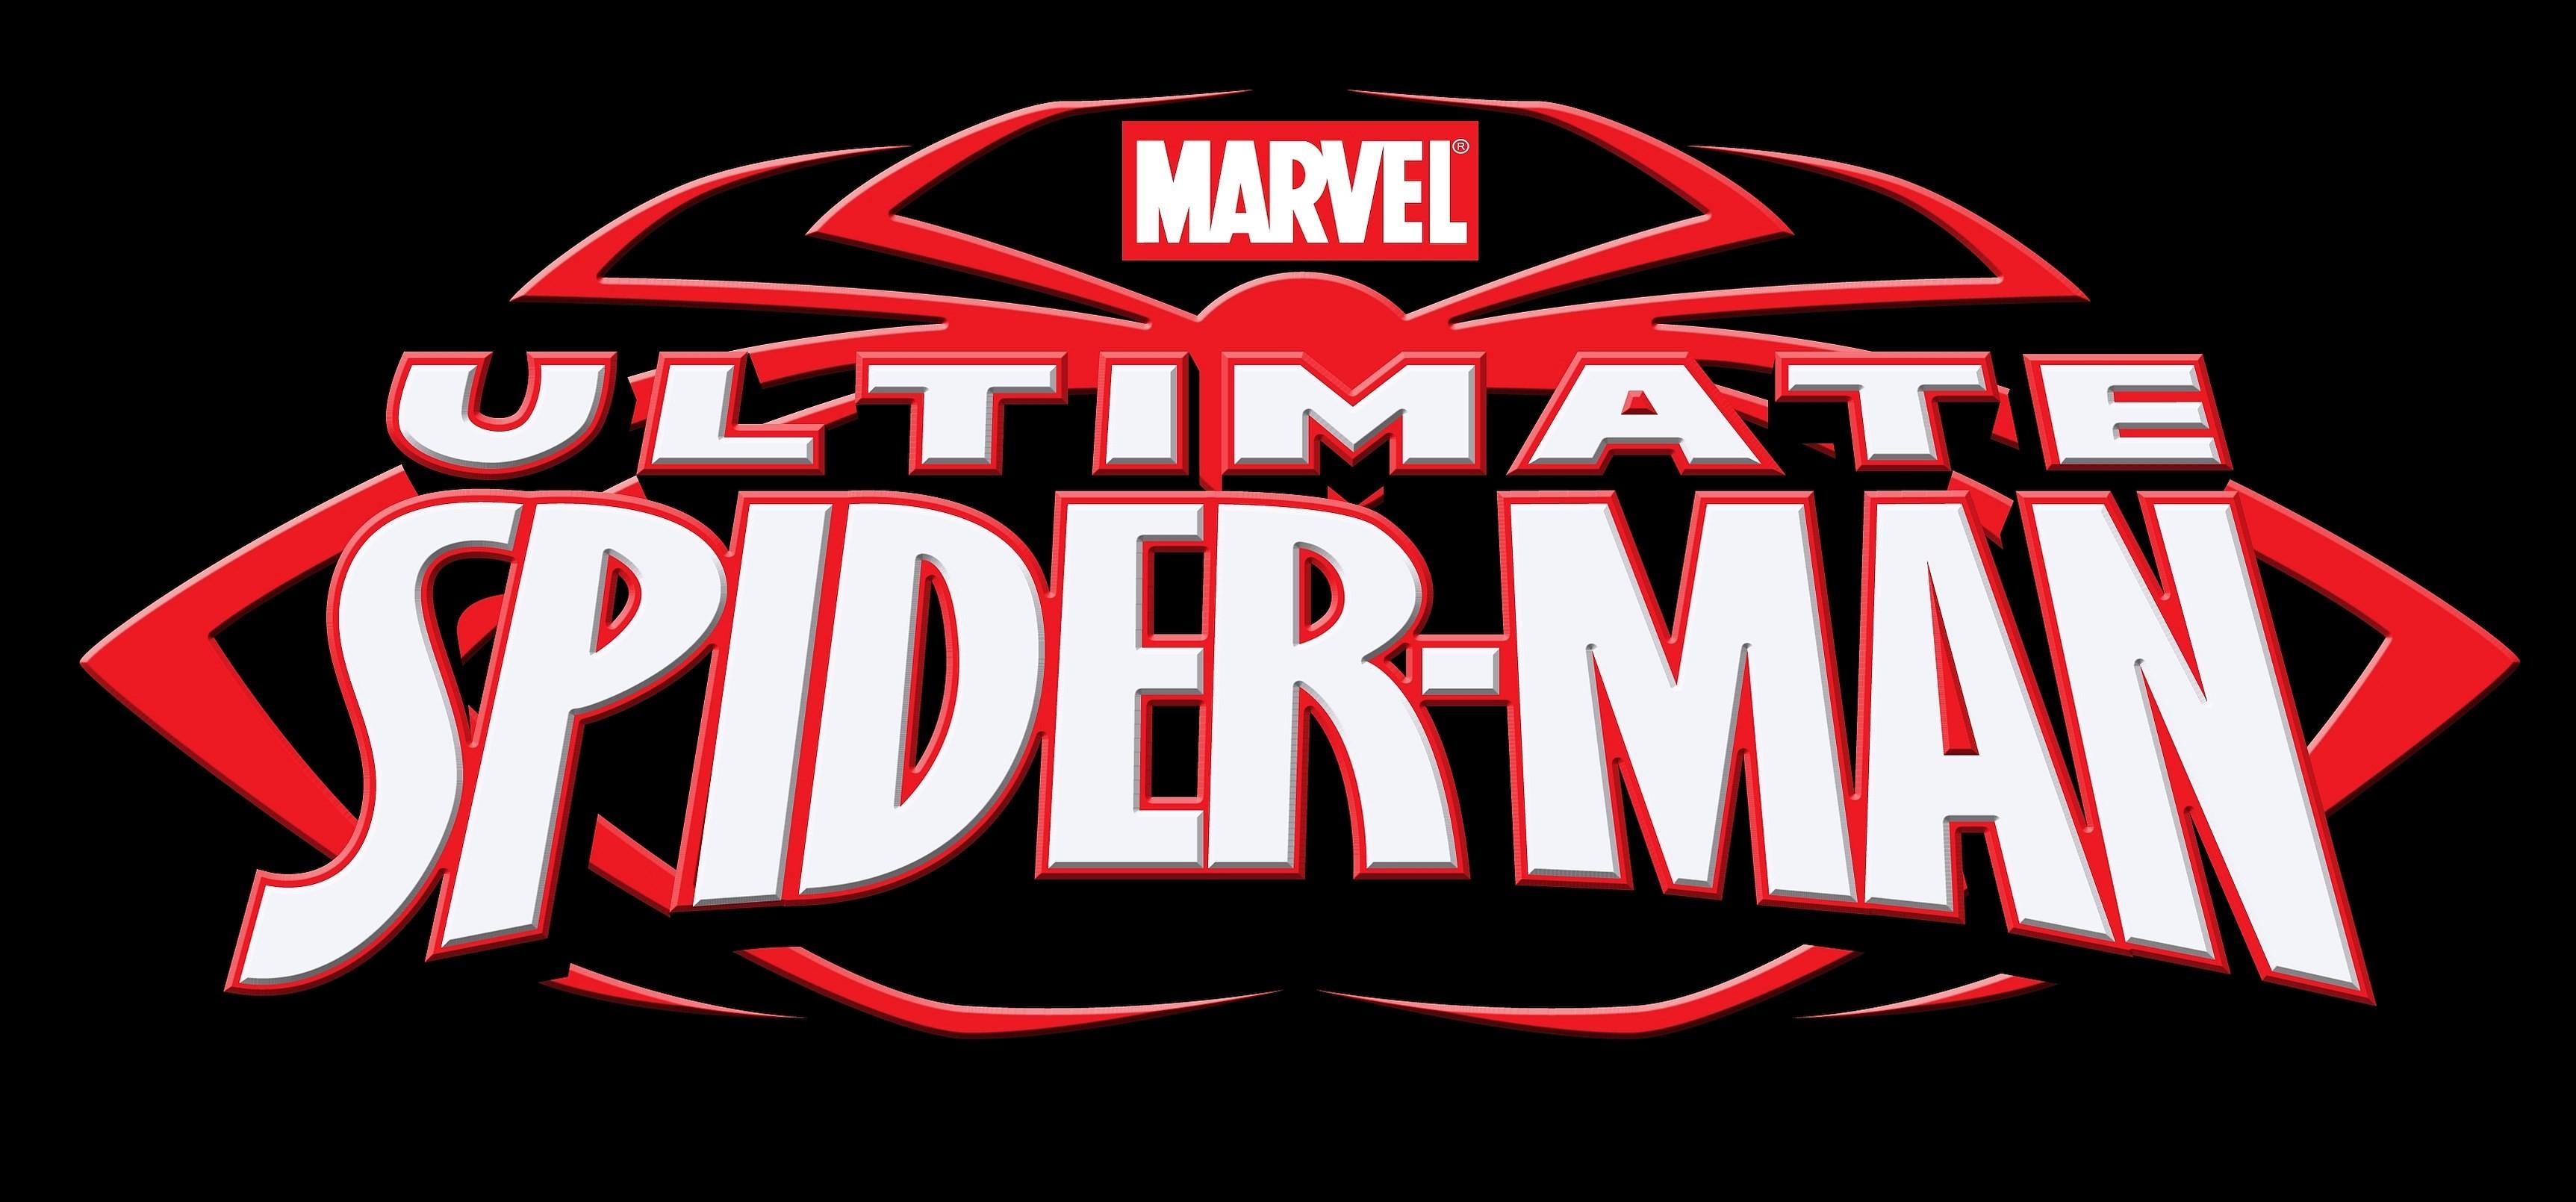 ultimate spider man hd wallpaper (Satchel Fletcher 3450×1610)